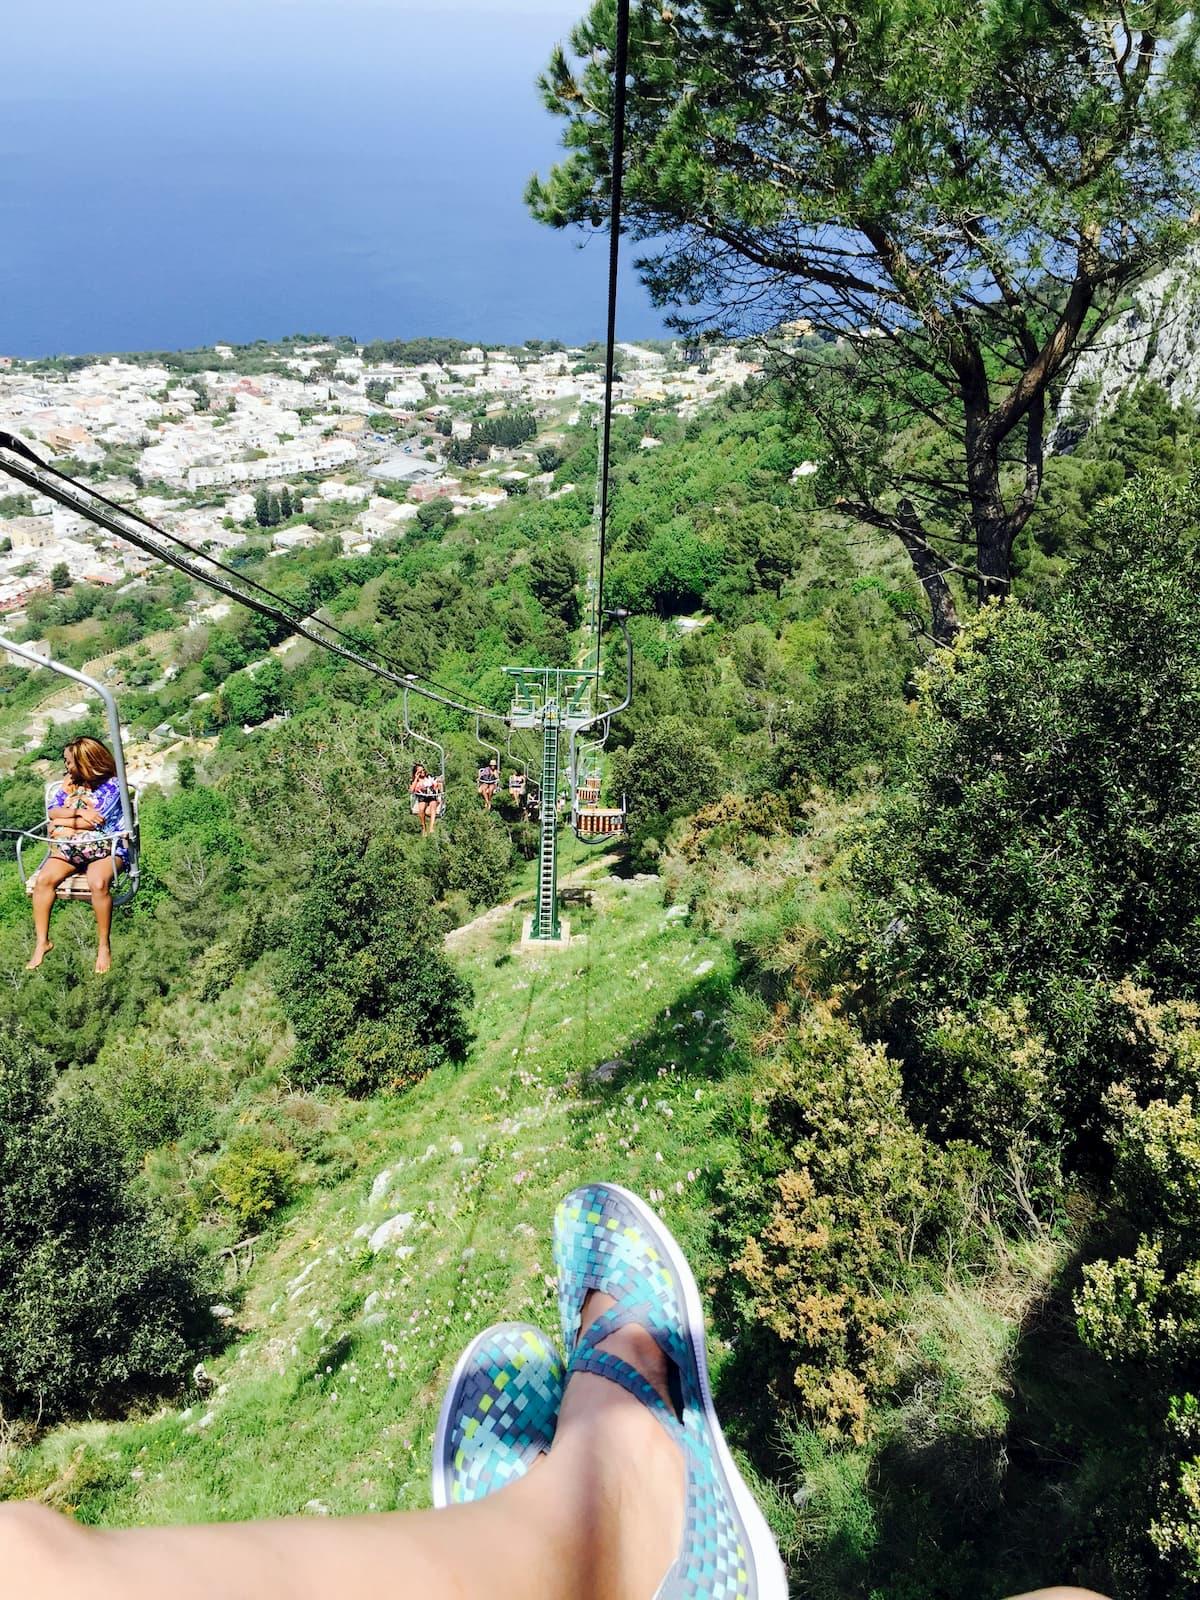 Chair Lift up Monte Solaro in Anacapri, Italy